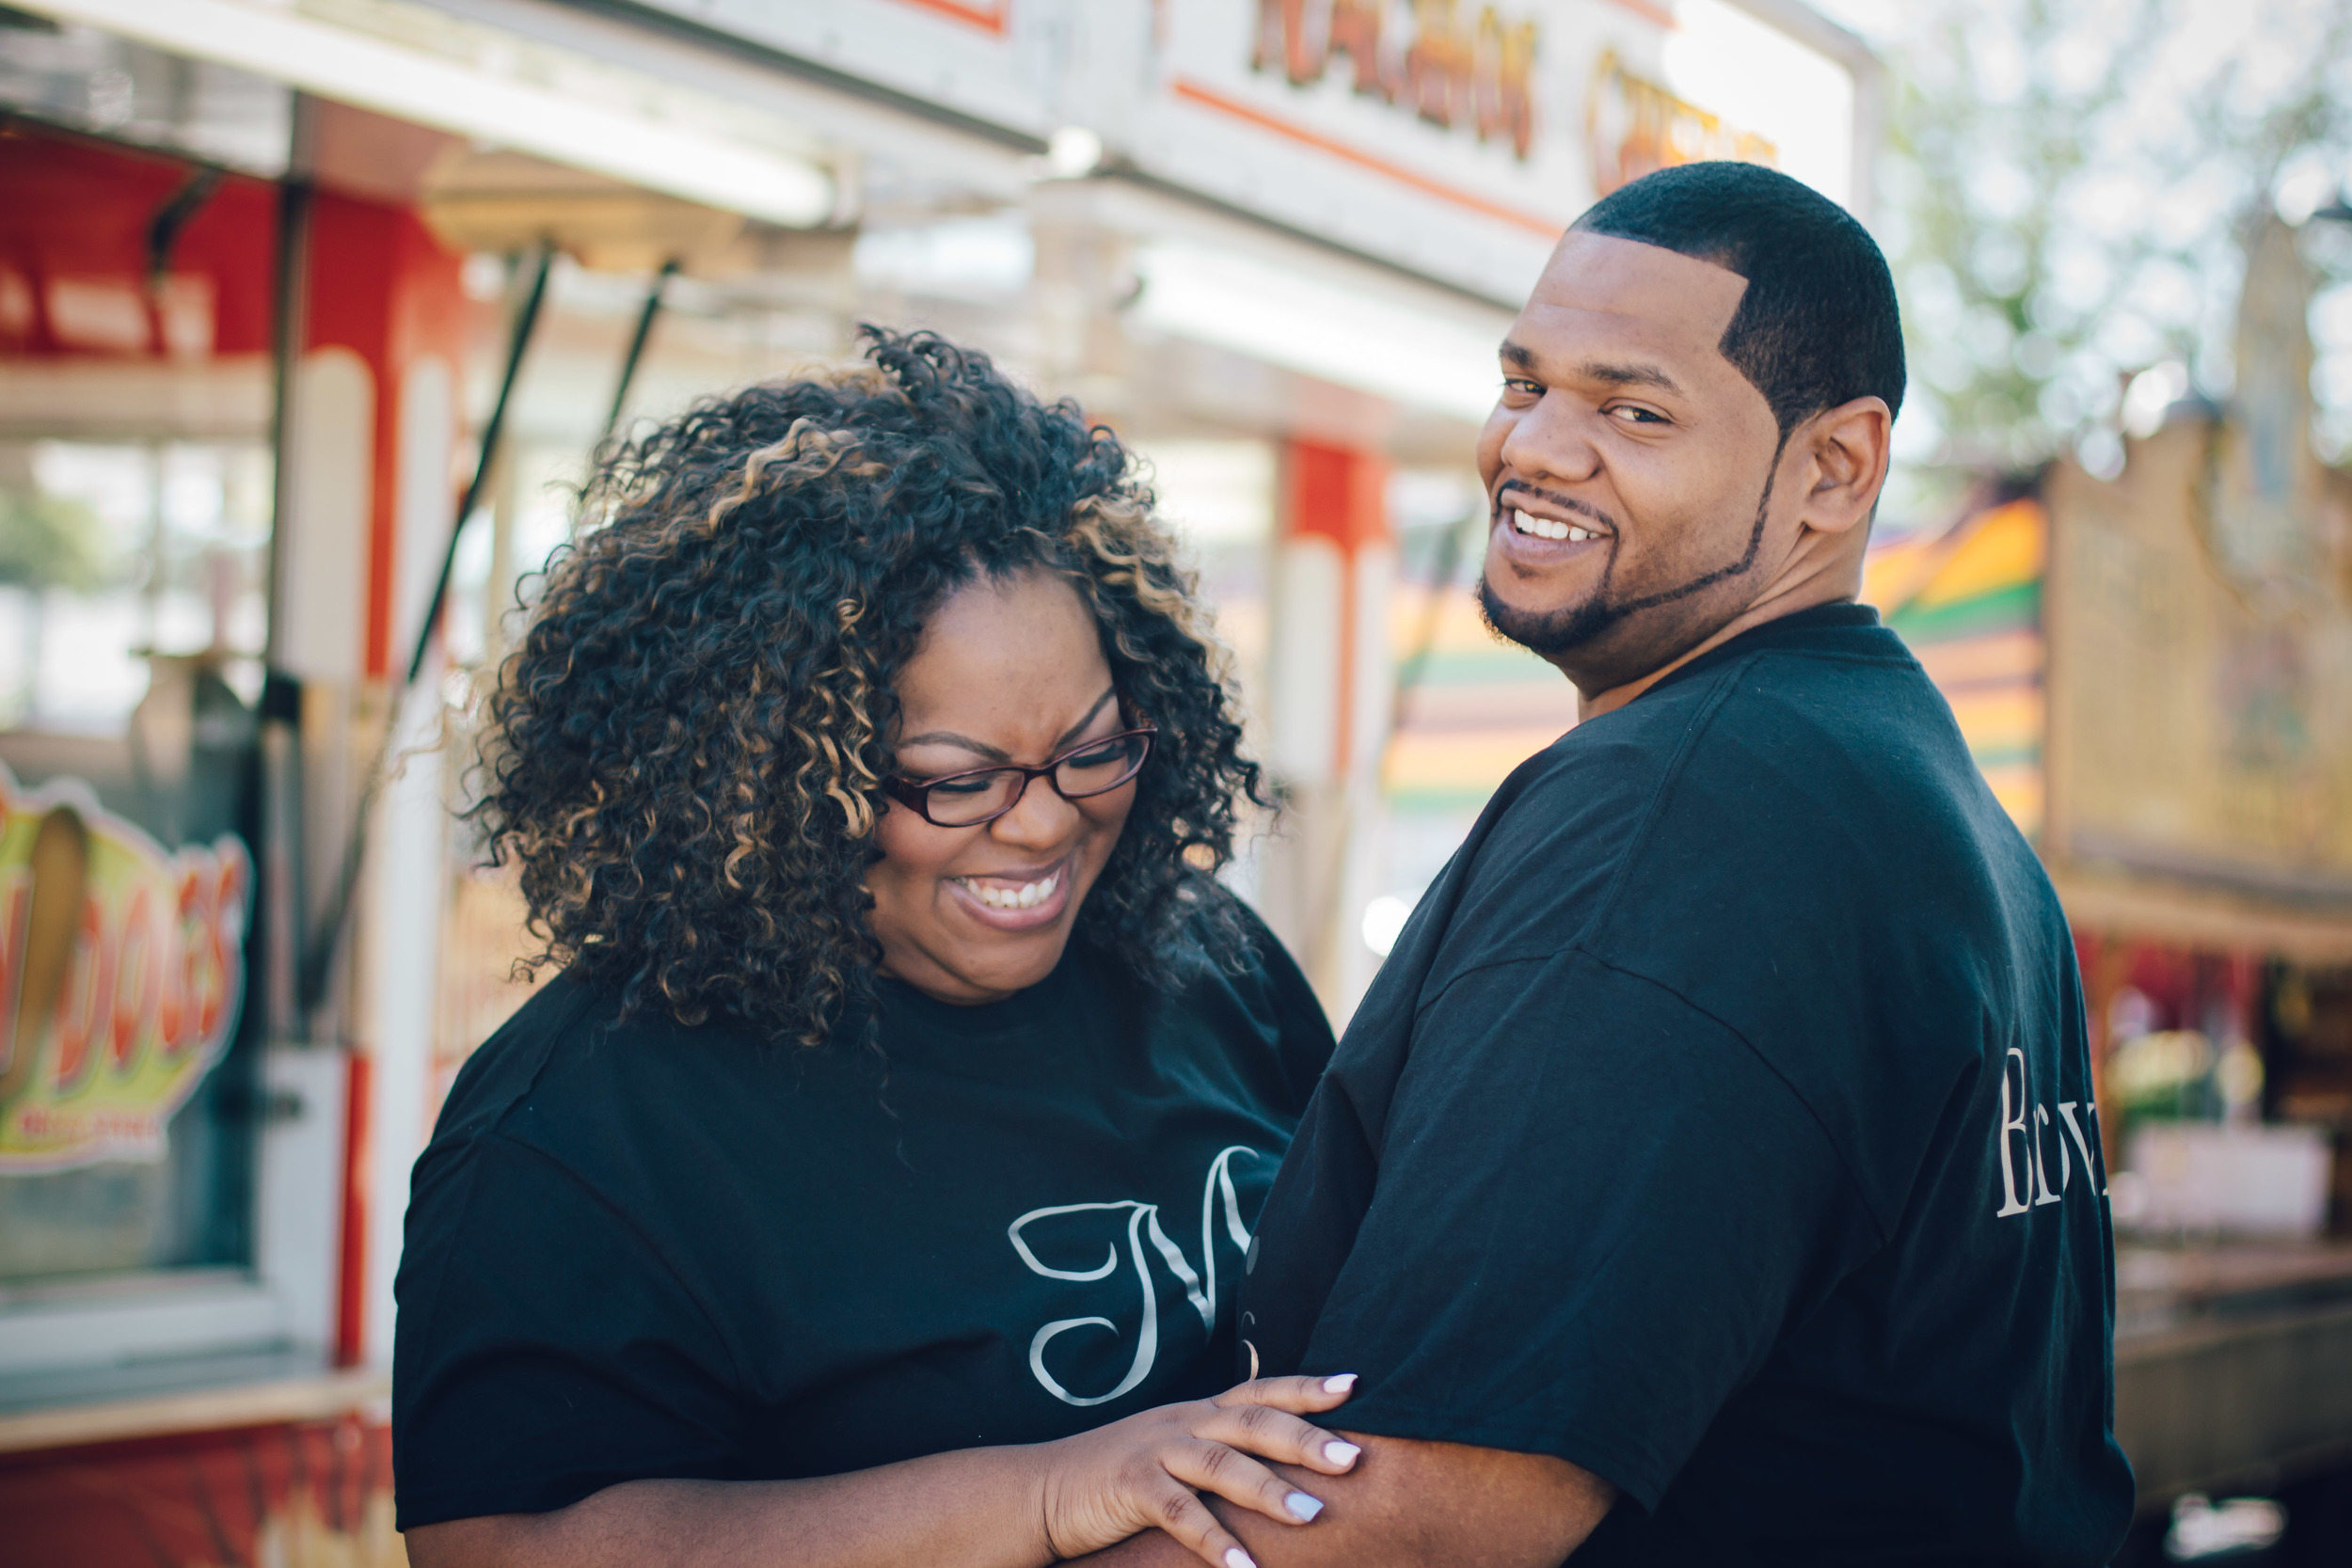 Farmville NC Dogwood Festival Engagement Photos | Shaunelle + Drake | Greenville NC Photographer | Bryant Tyson Photography | Engagement Portraits Ideas | www.memoriesbybryant.com